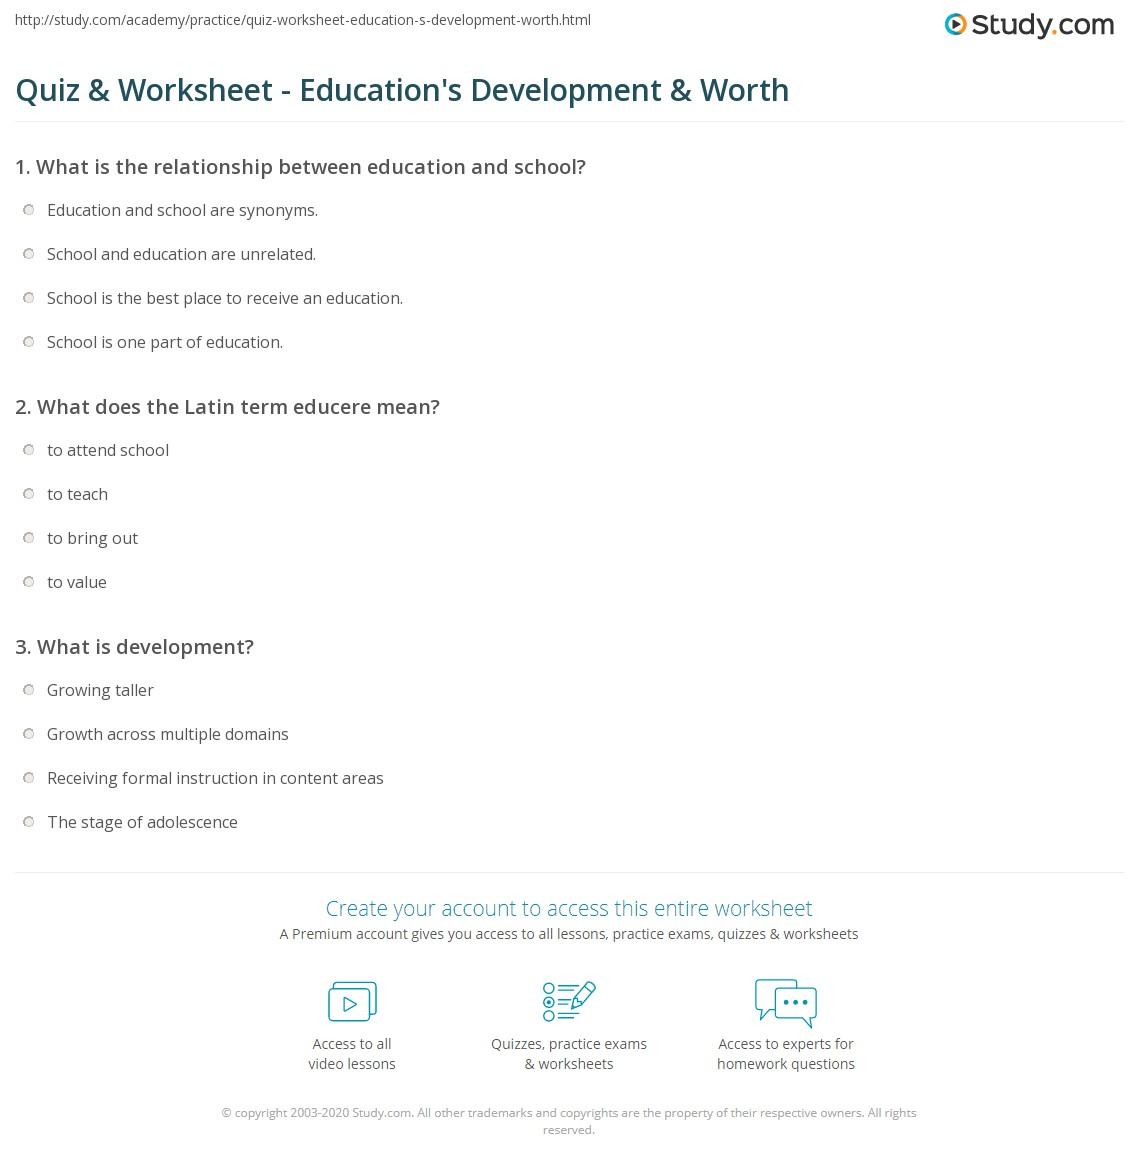 Quiz & Worksheet - Education's Development & Worth   Study com